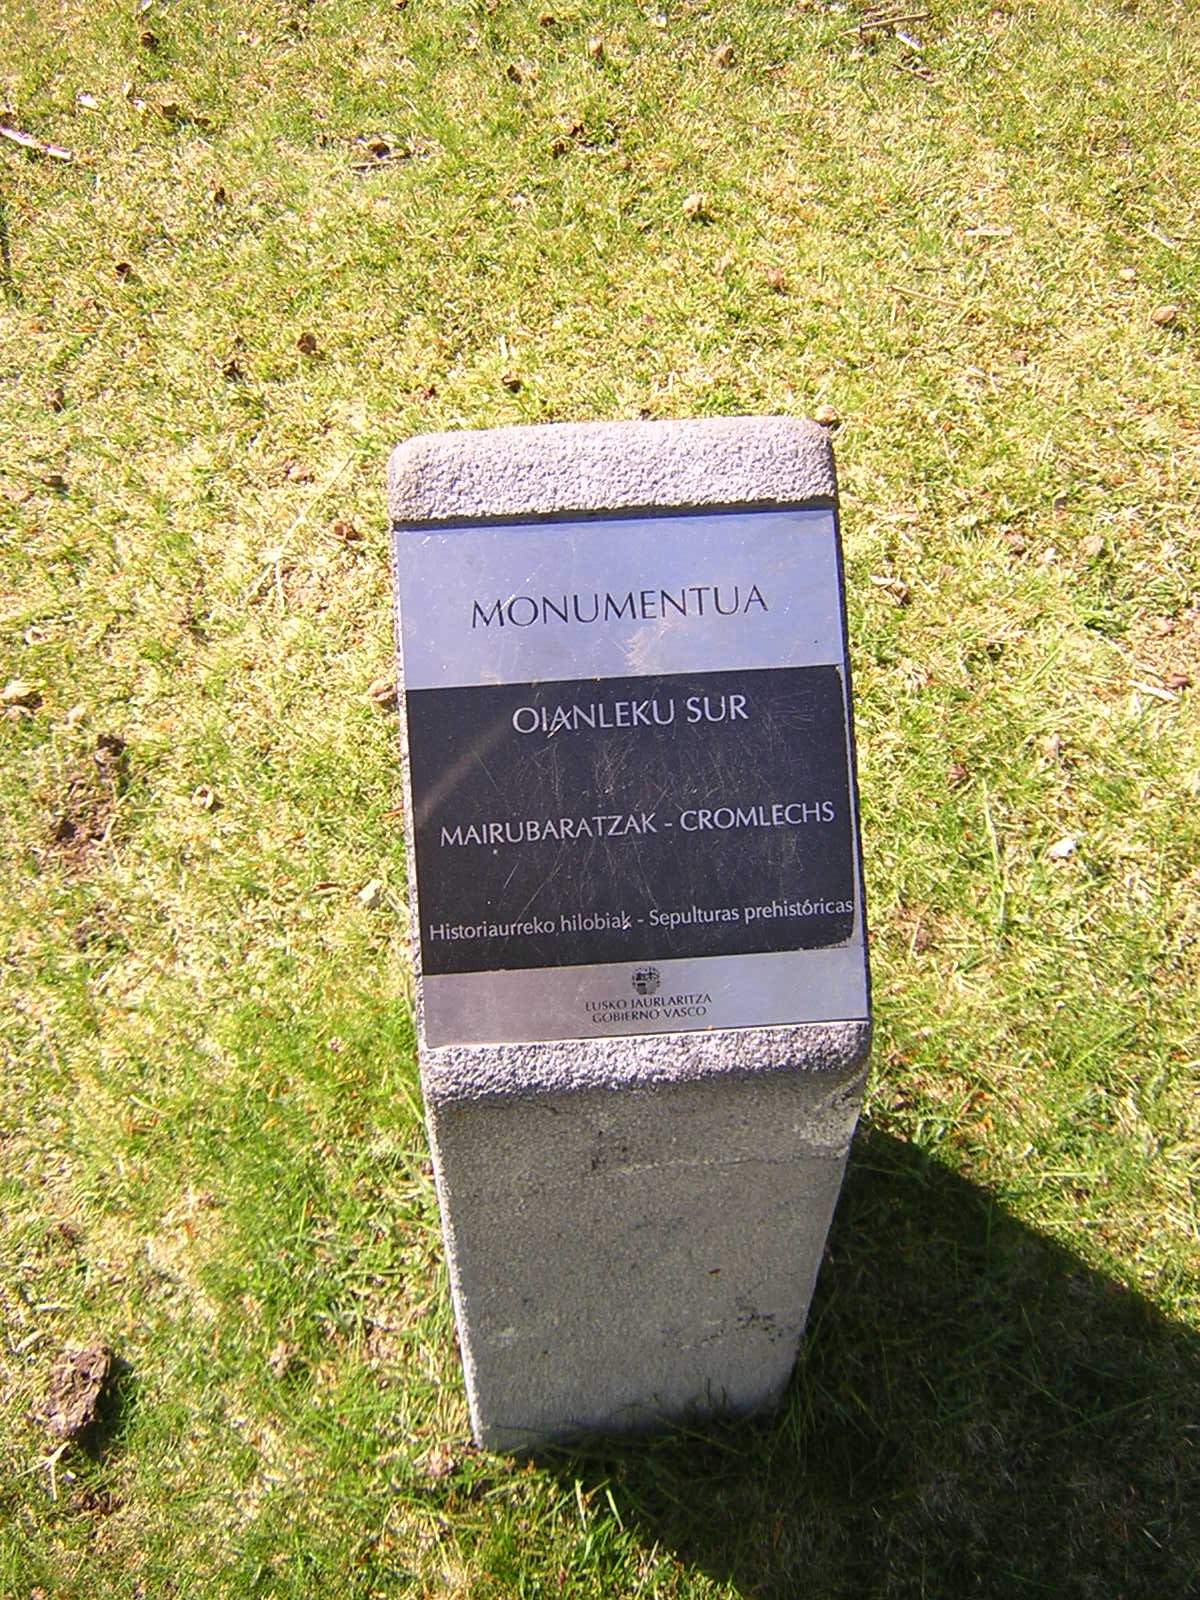 Cromlech Oianleku sur Mairubaratza